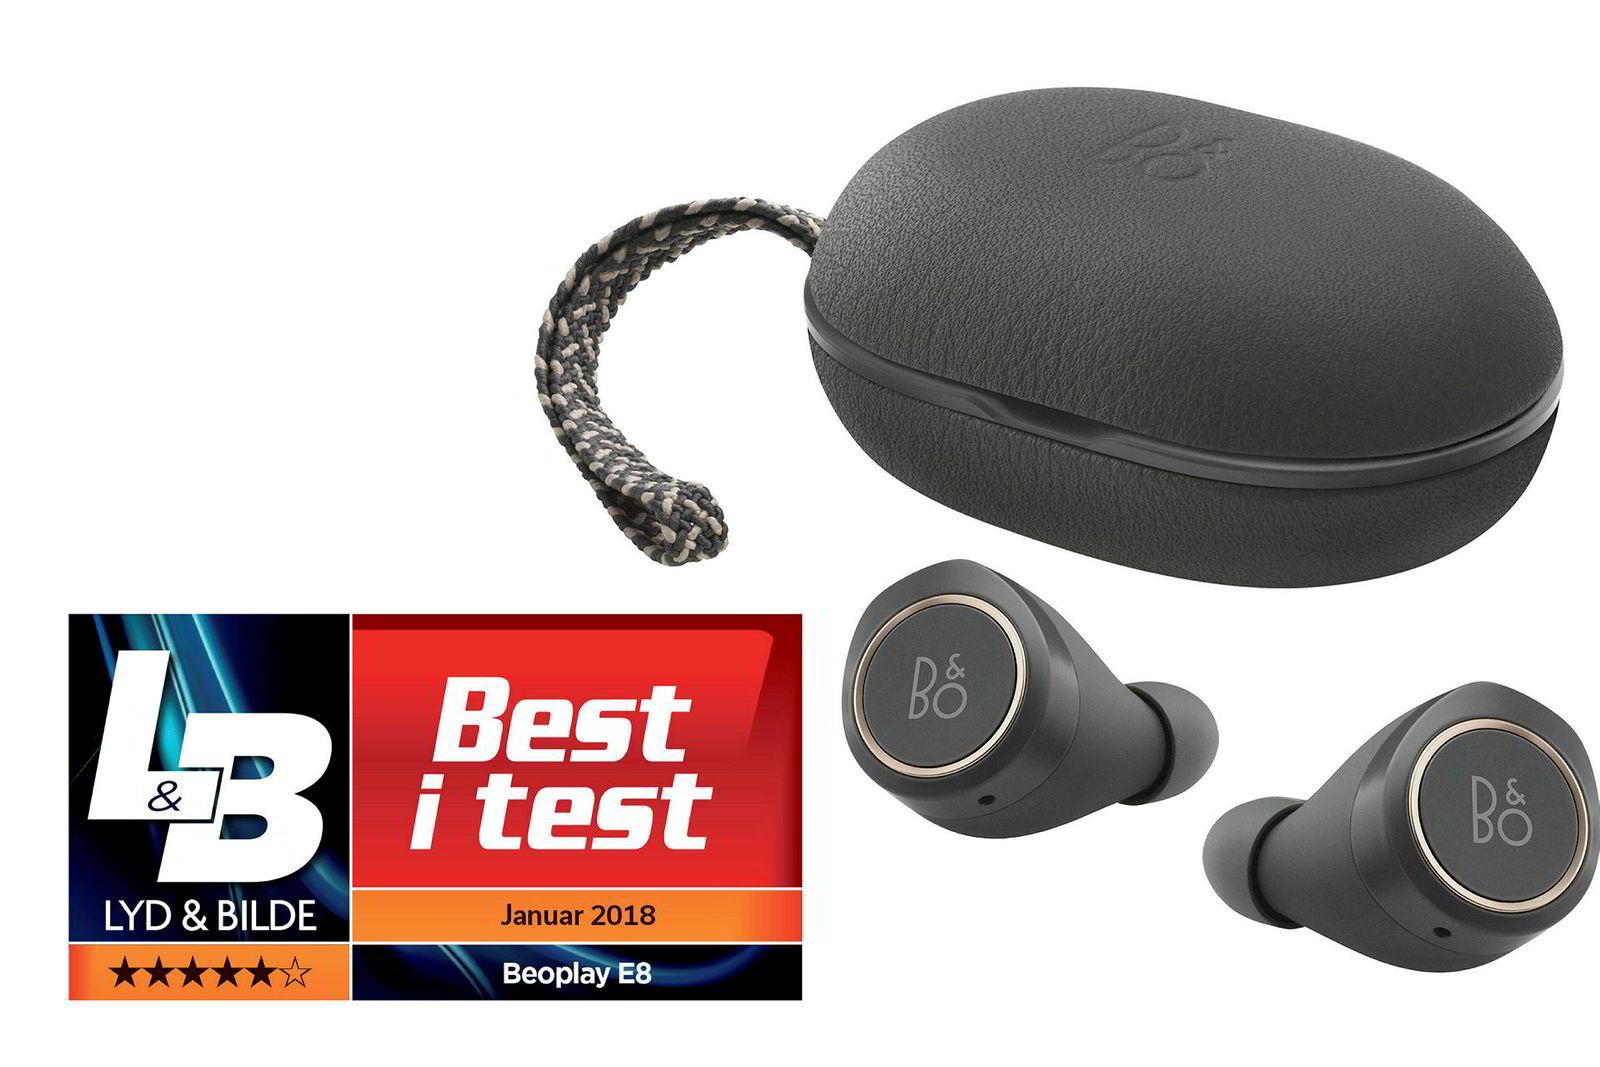 6355b4650 Test av trådløse ørepropper | DN